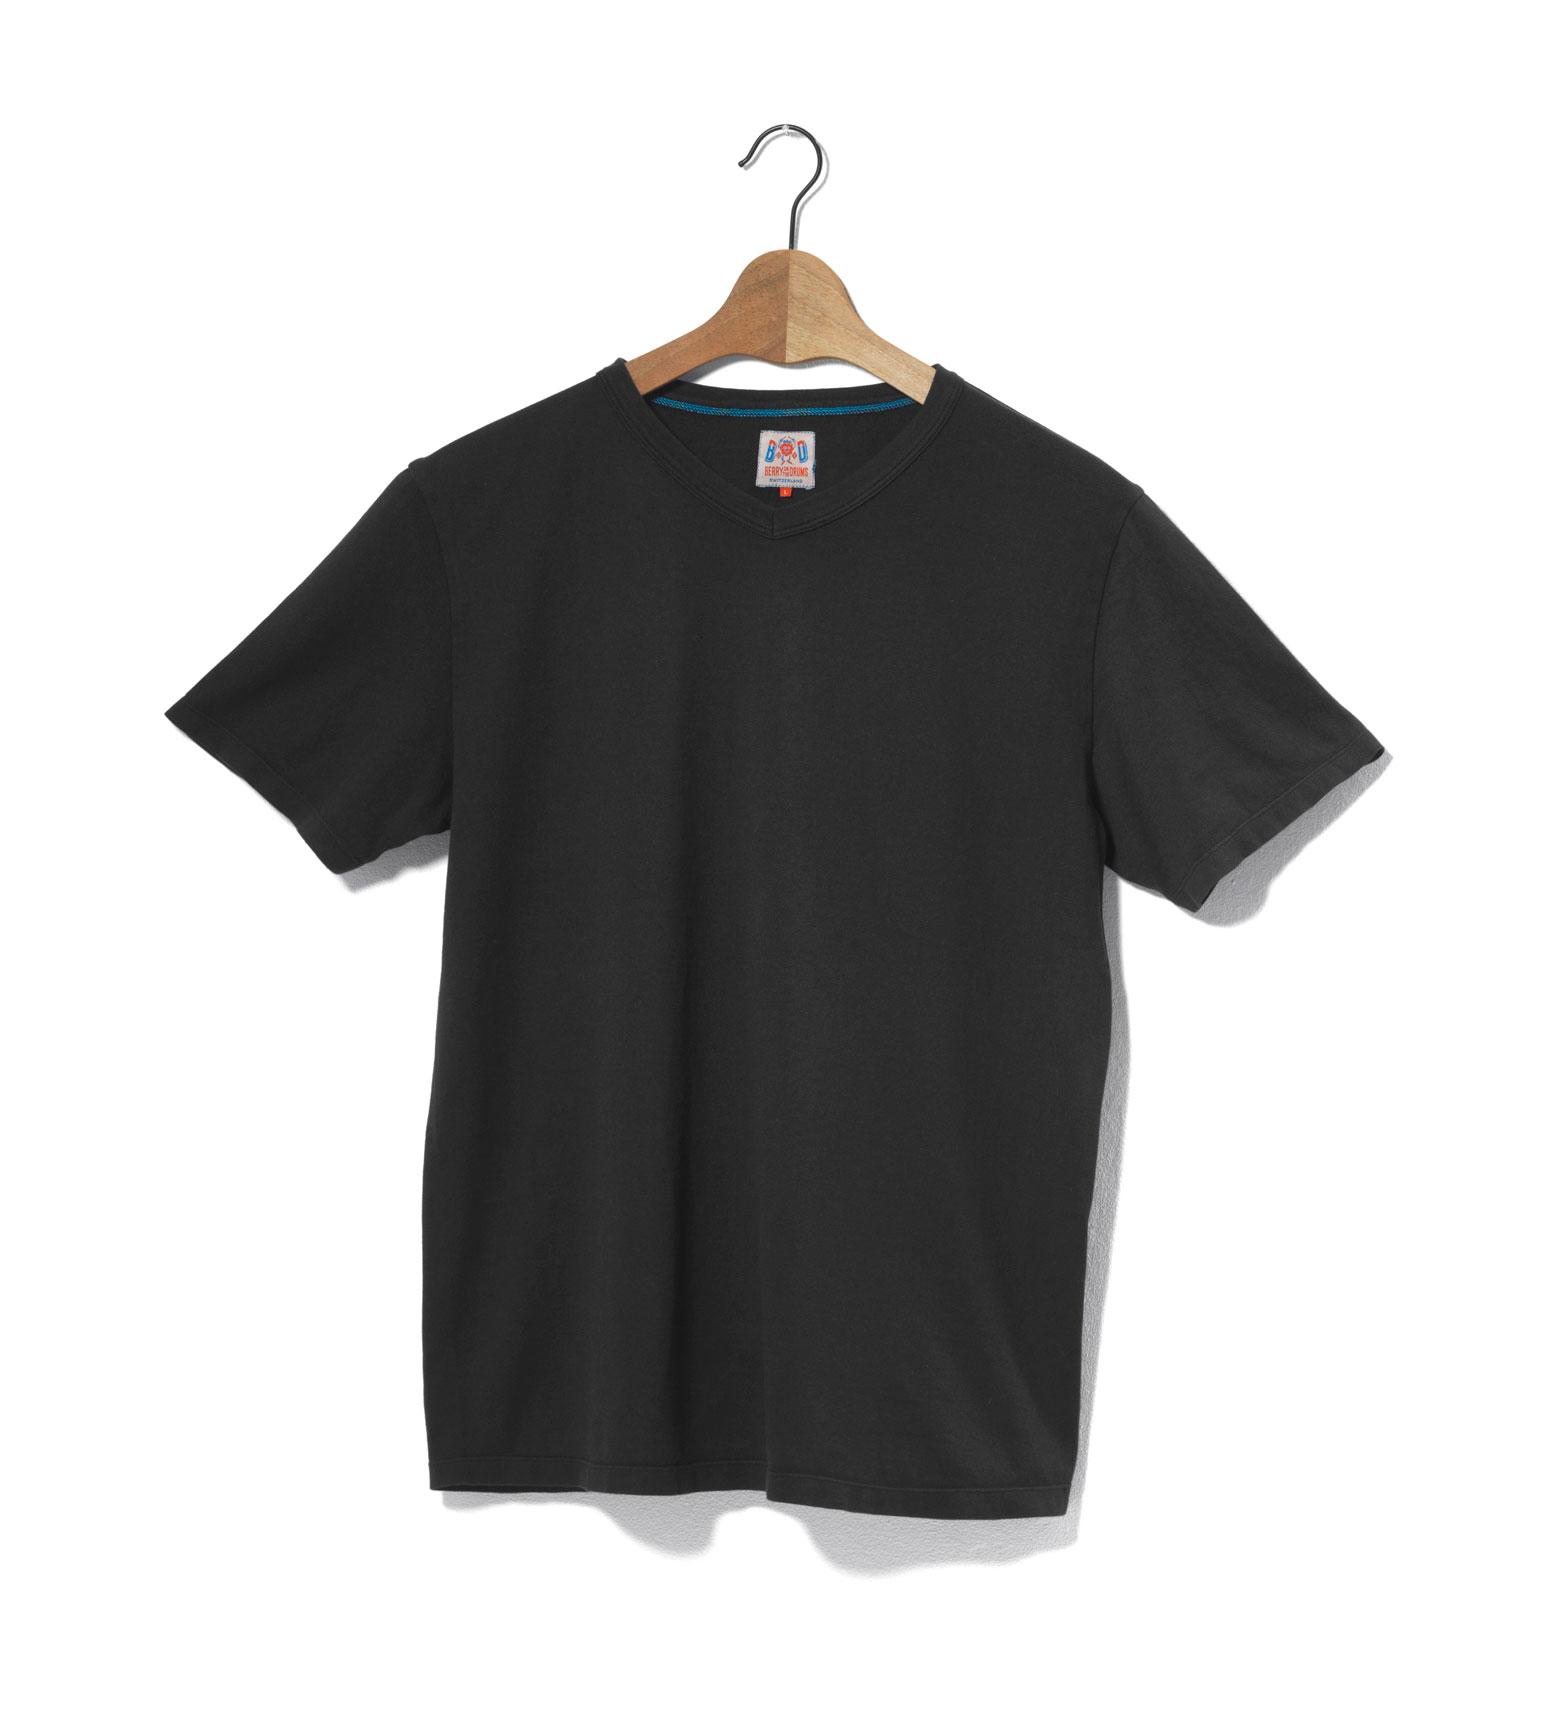 Image of V-Neck Tee Single Jersey